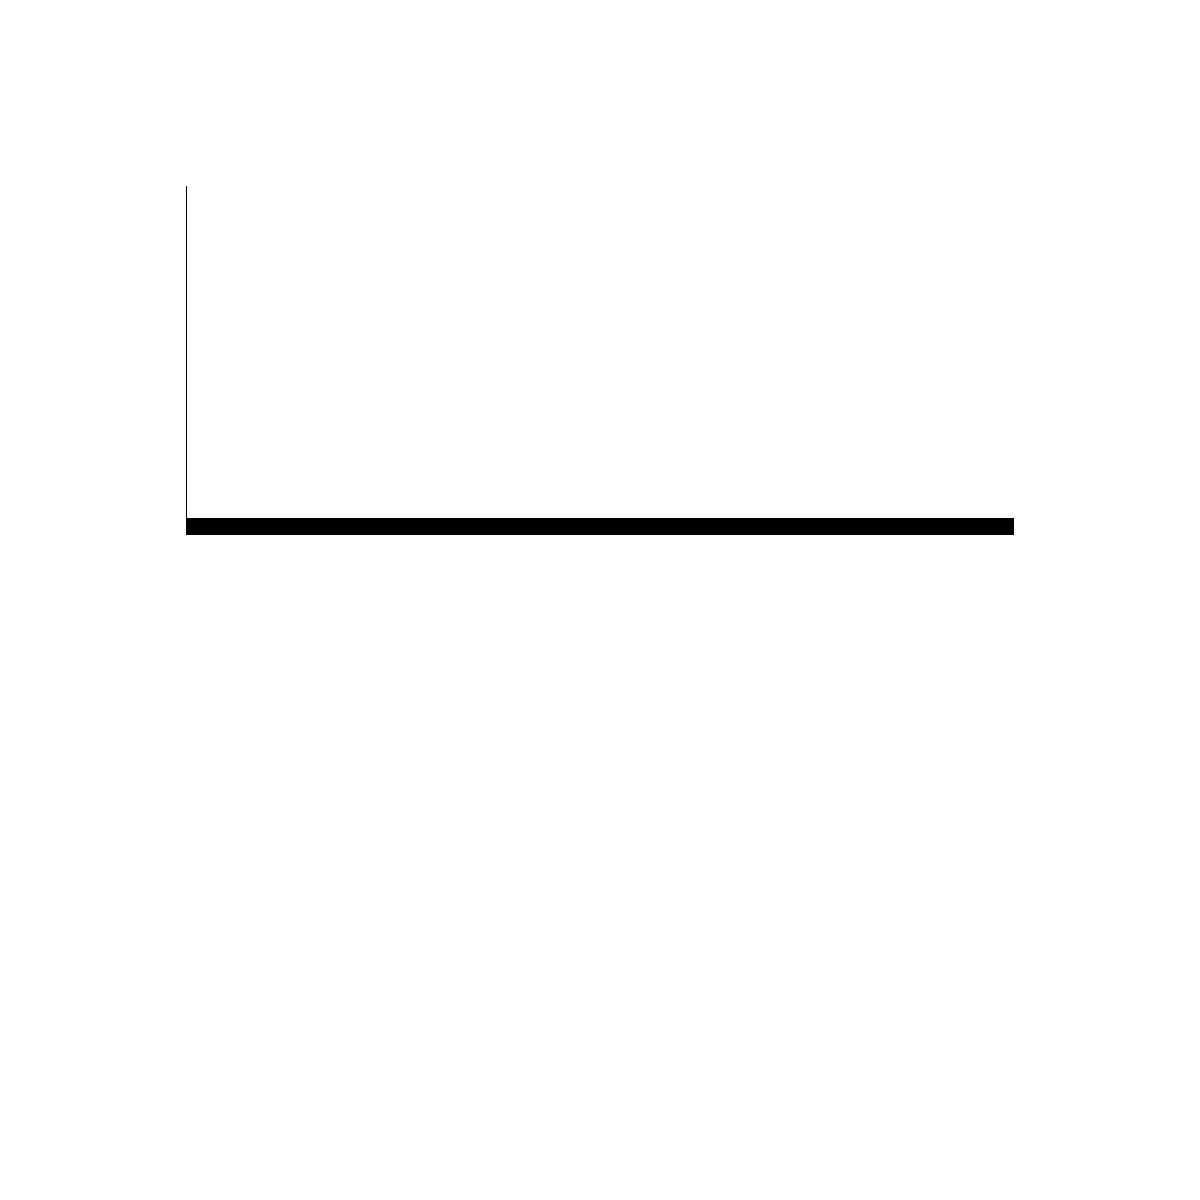 solar panel roof icon